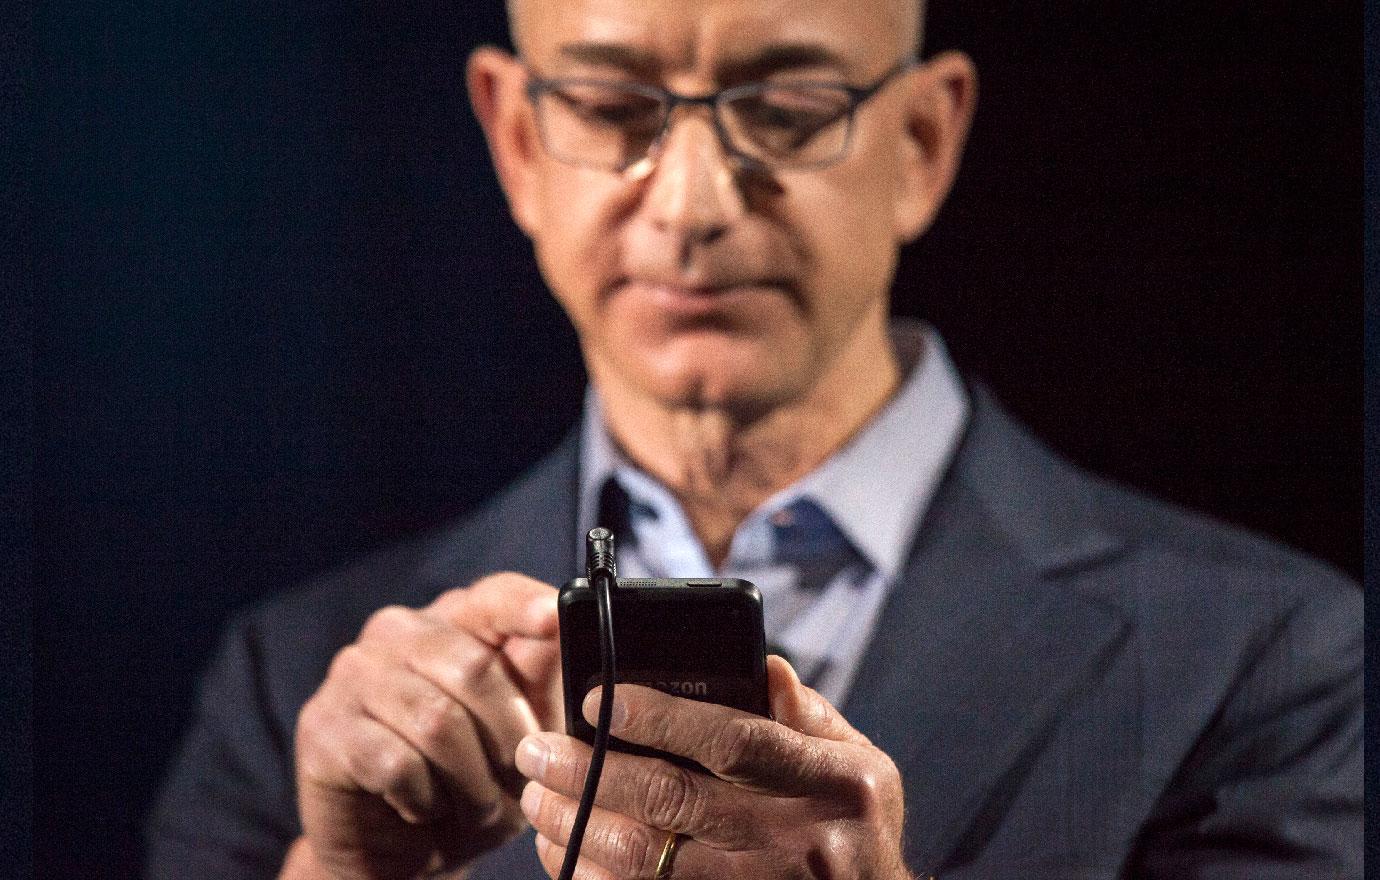 Jeff Bezos Shared Wife's Pillow Talk With Mistress Lauren Sanchez